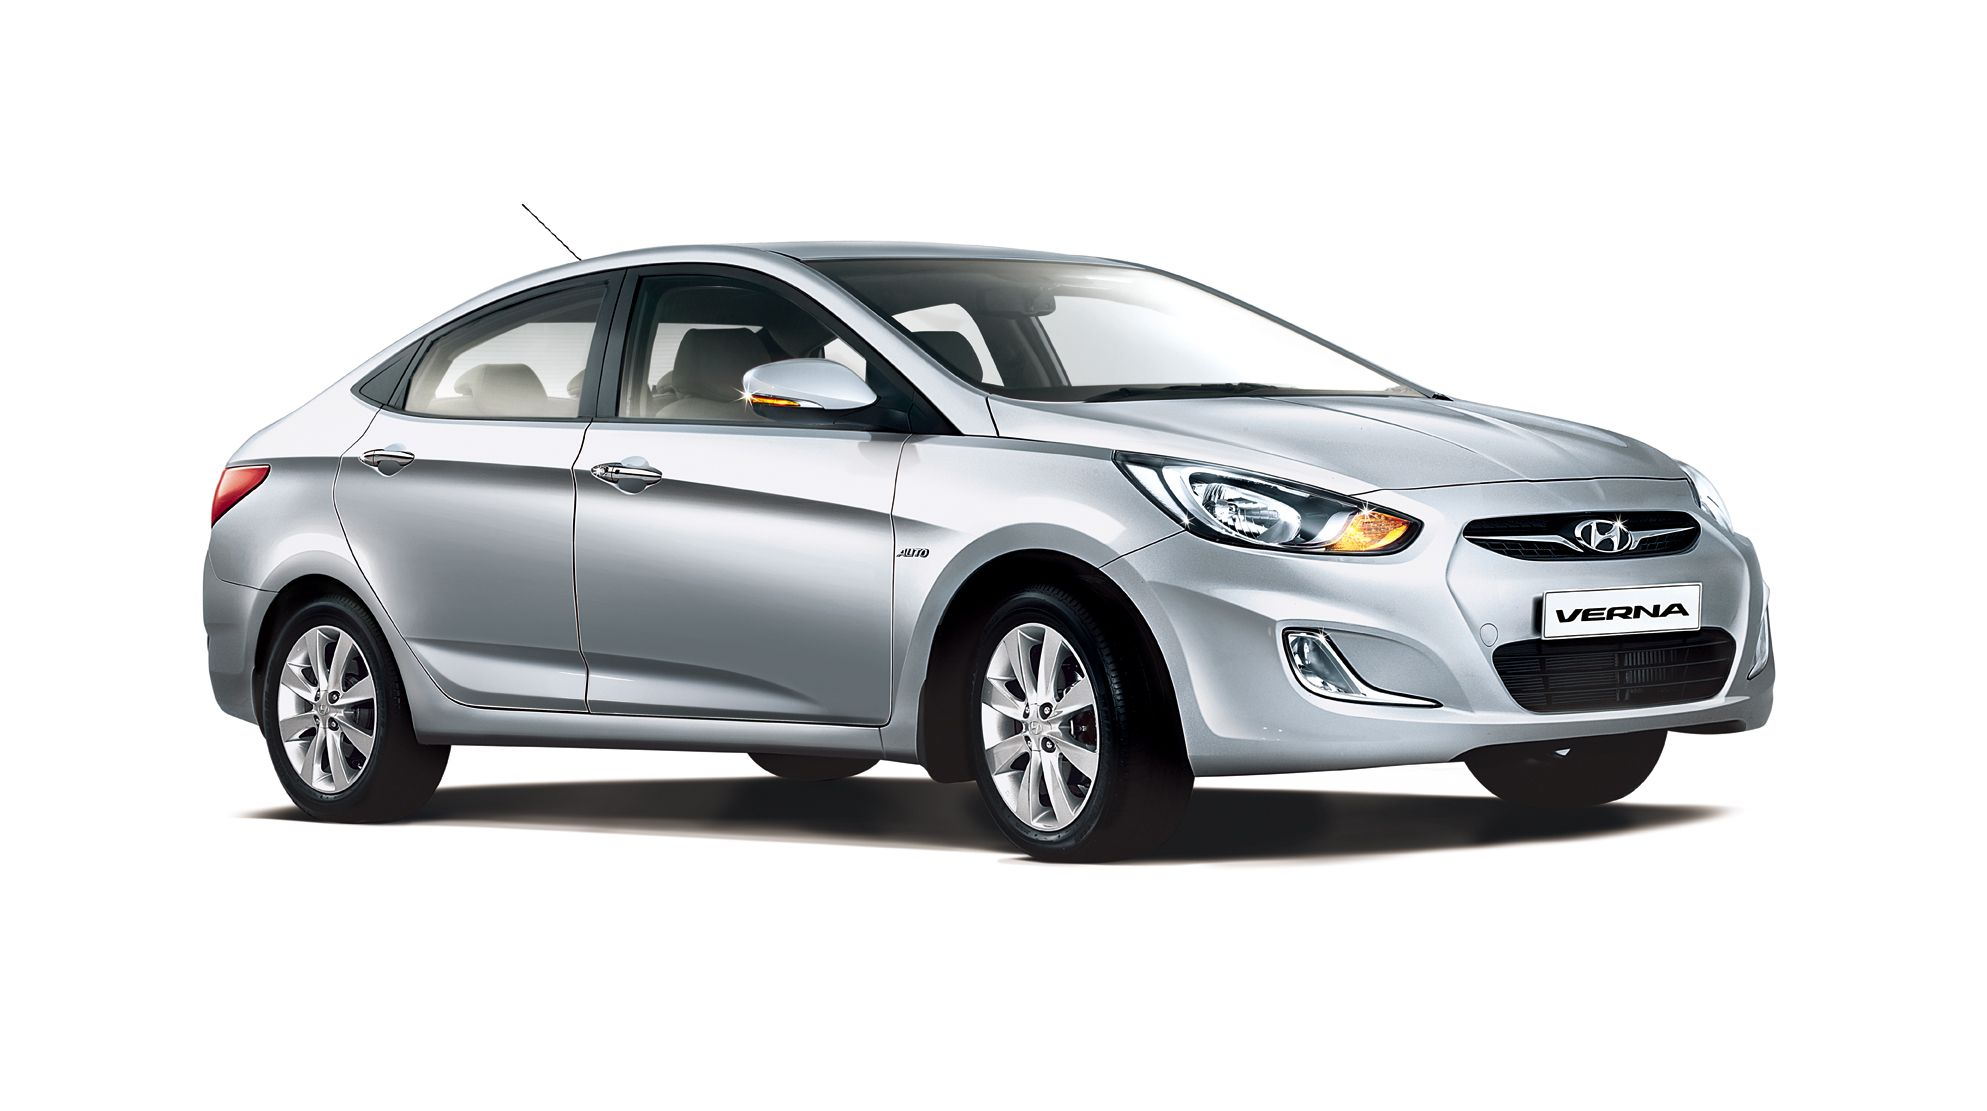 Hyundai Verna dual experience Car, Vehicles, Bmw